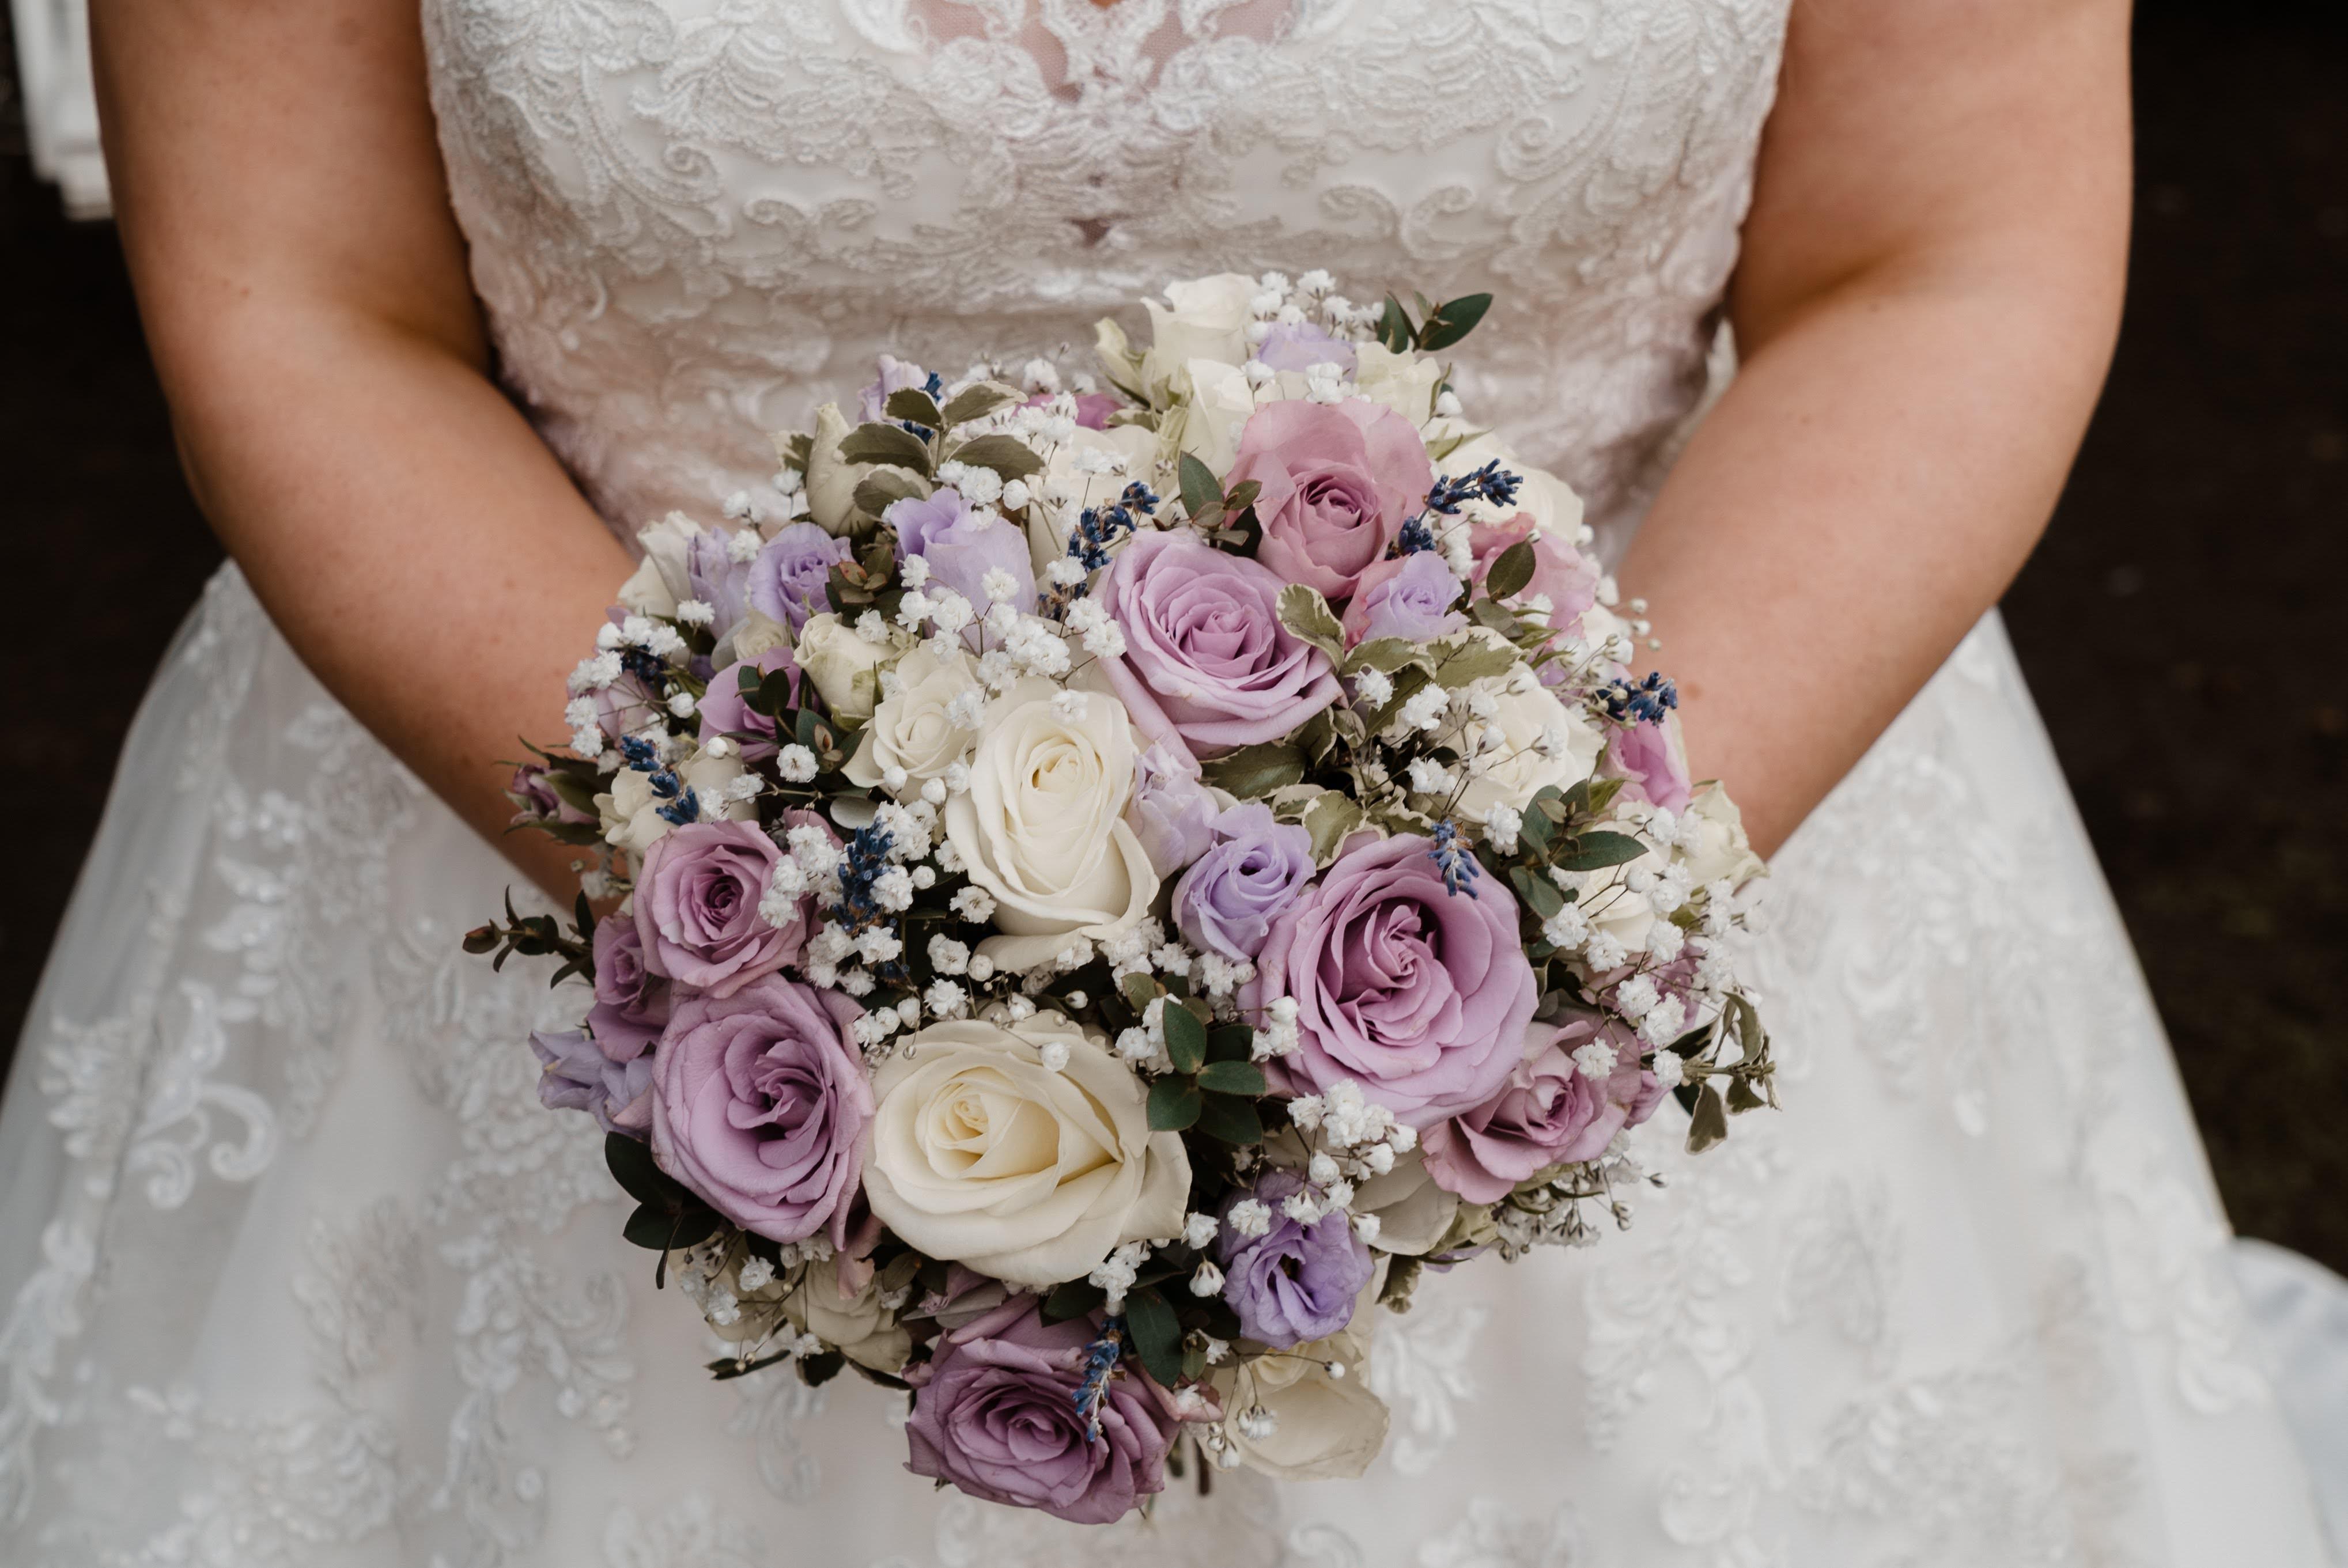 Weetwood Hall Wedding Leeds 3 - Sneak Peek - Jessica & Jonathan  Weetwood Hall Wedding Leeds